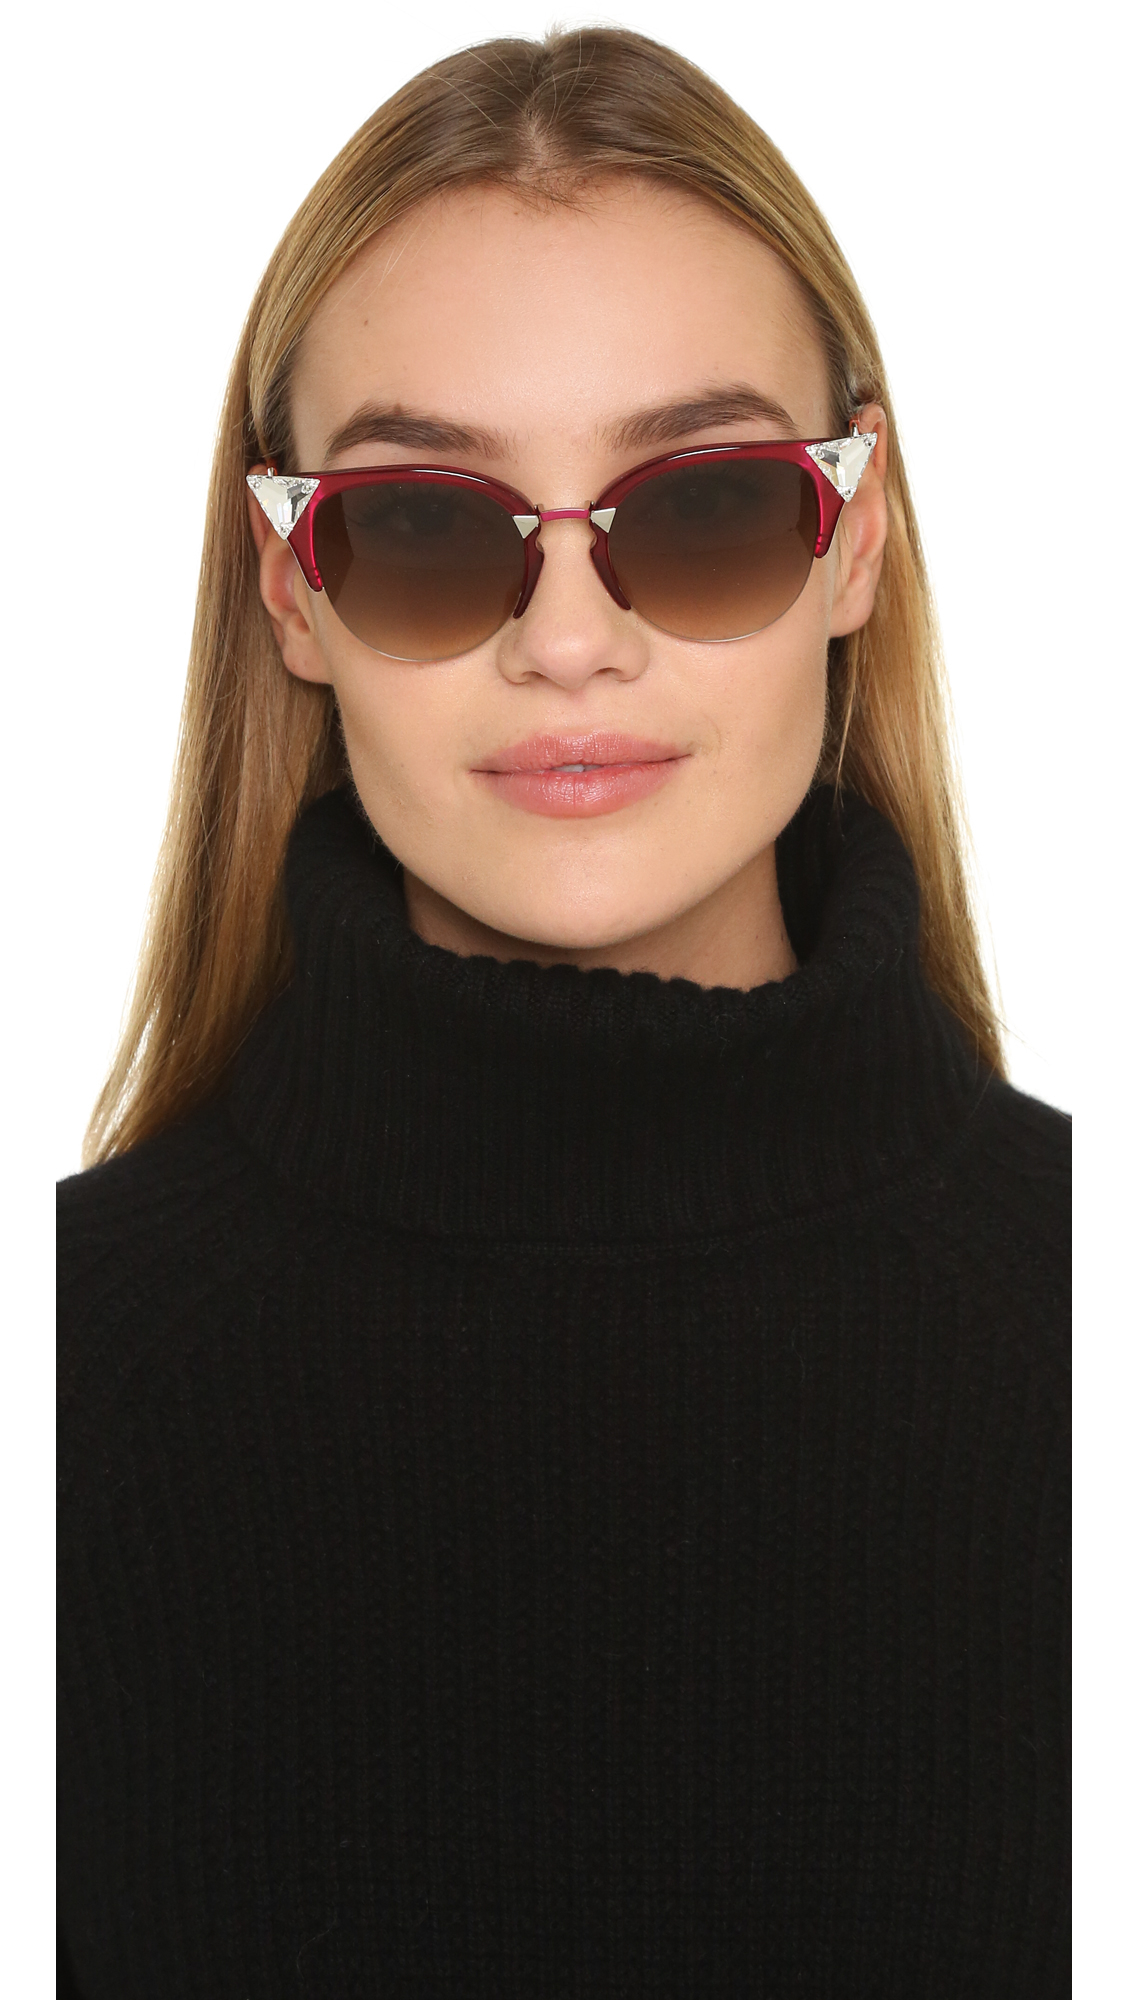 375f45494d98 Lyst - Fendi Crystal Corner Sunglasses in Red